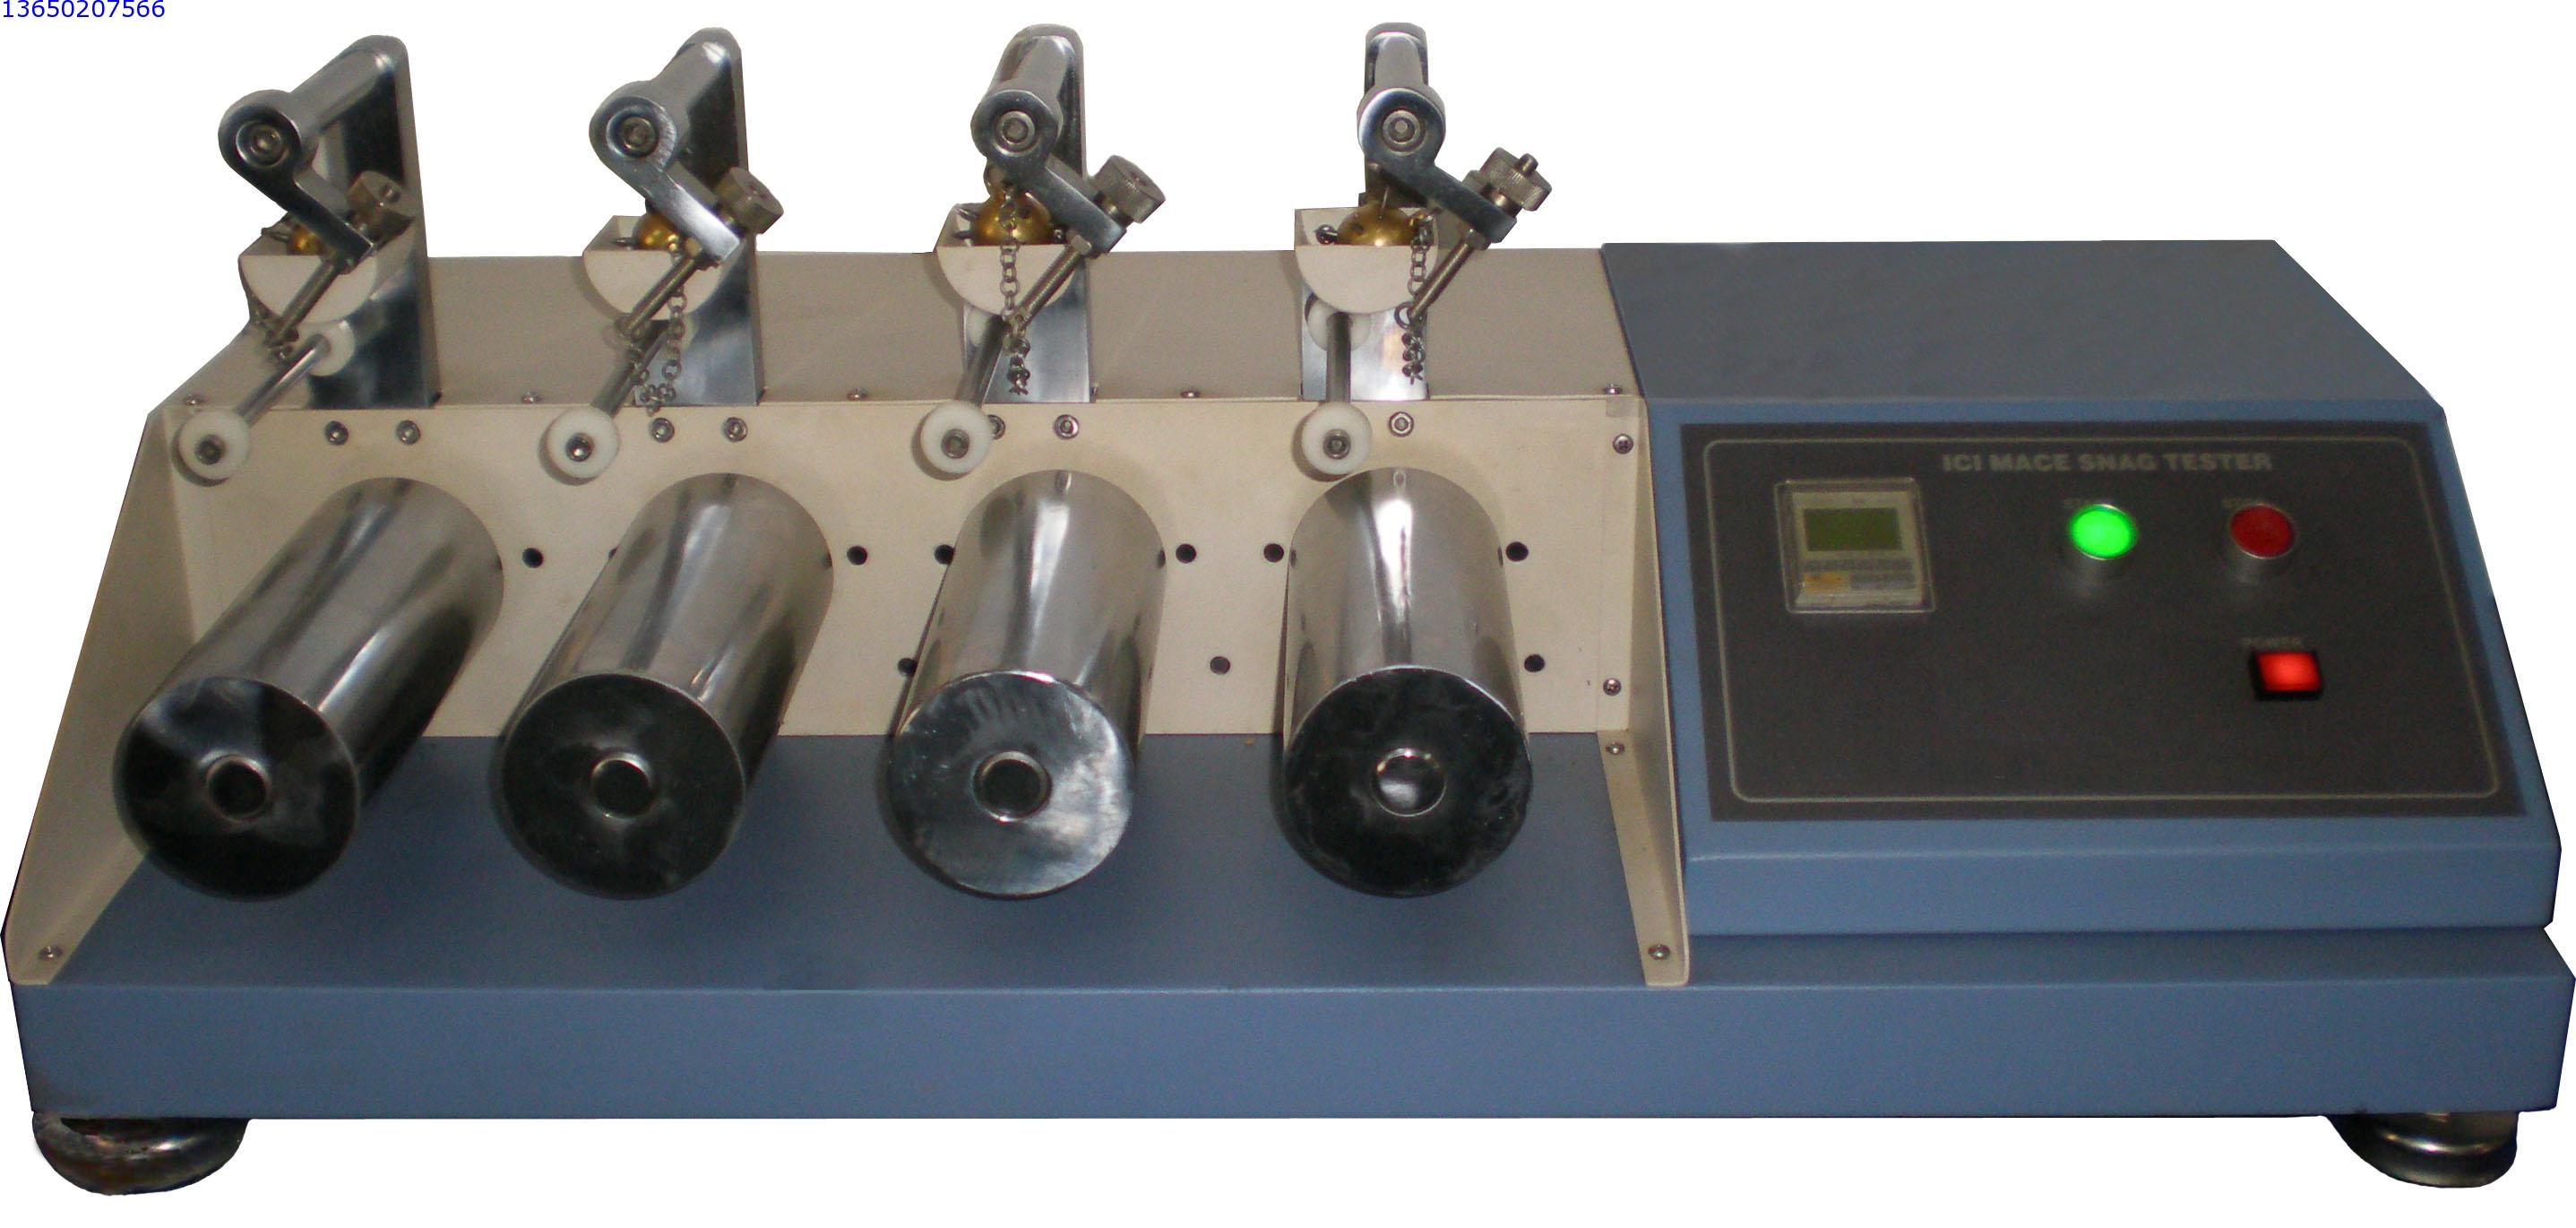 QI-S-004 ICI钉锤式勾丝性测试仪